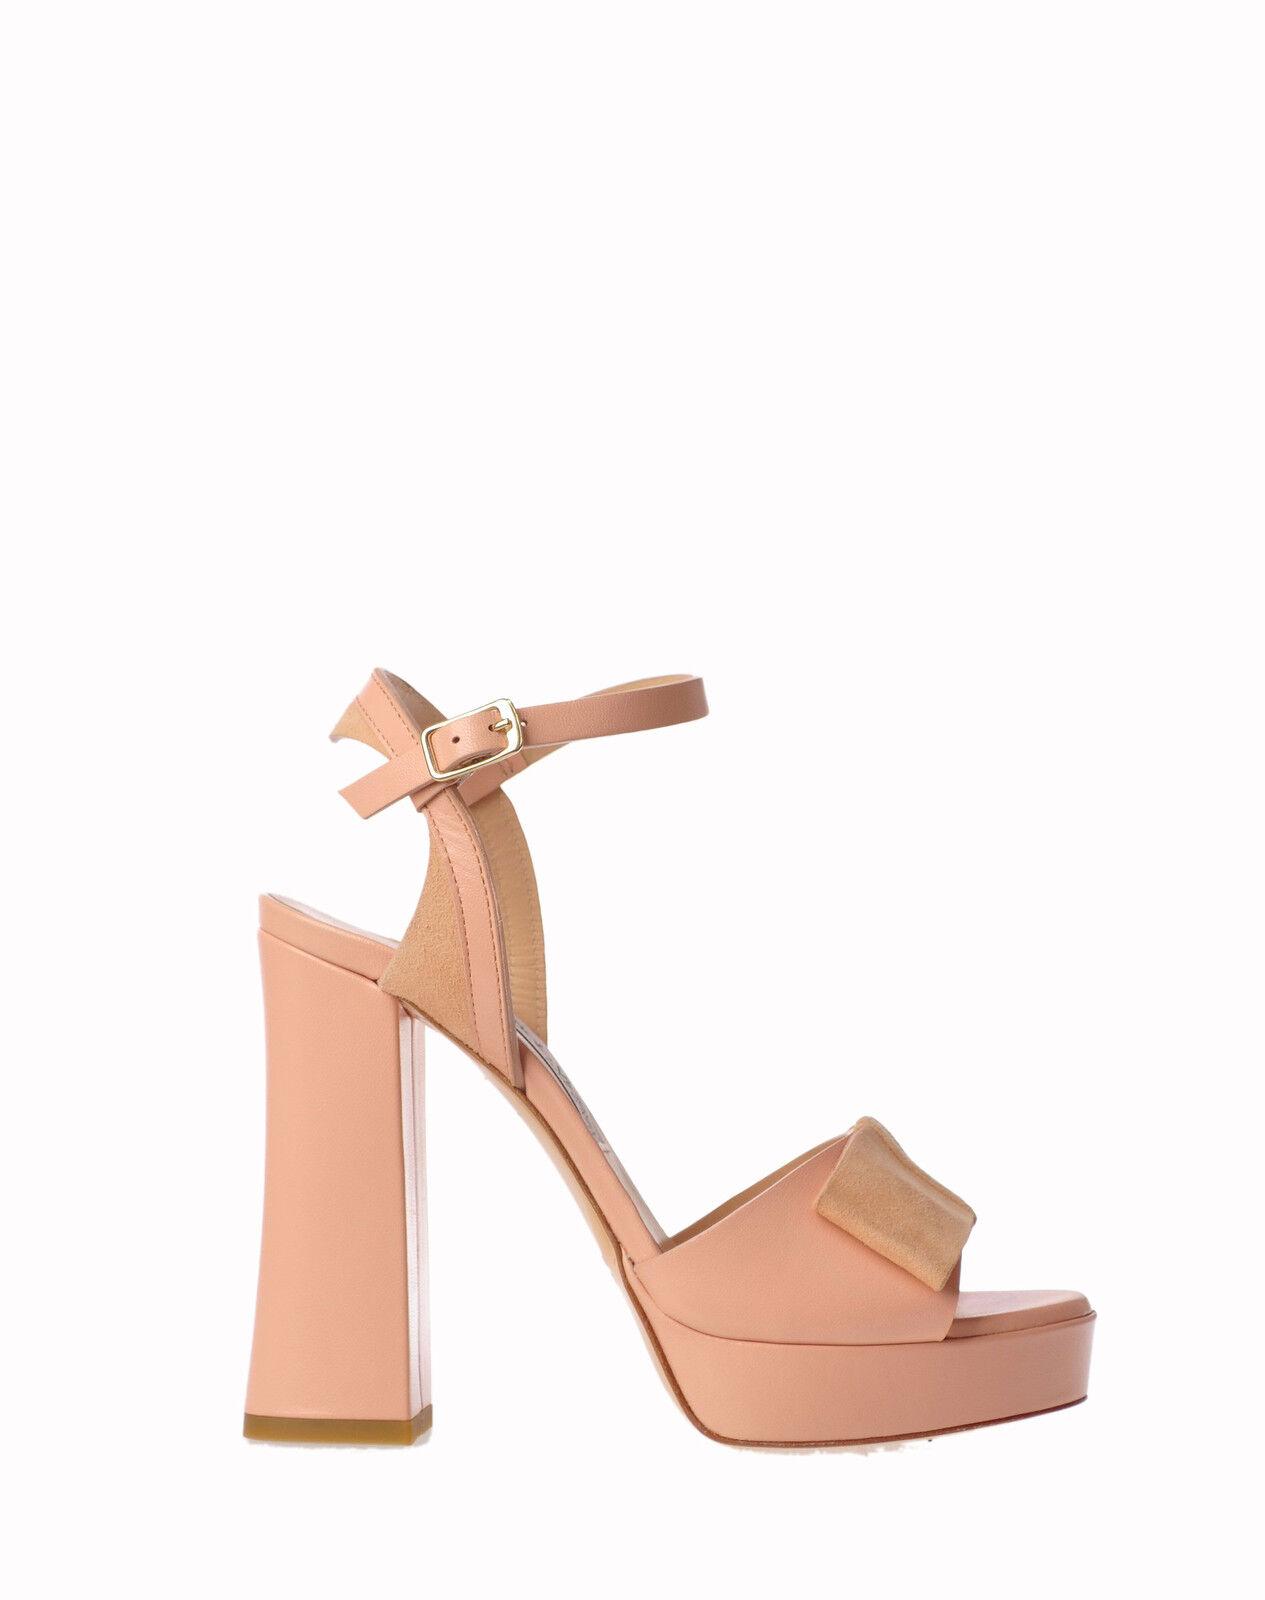 Le Viozzi  -  Schuhe - Weiblich - Rosa - 3693026A184413